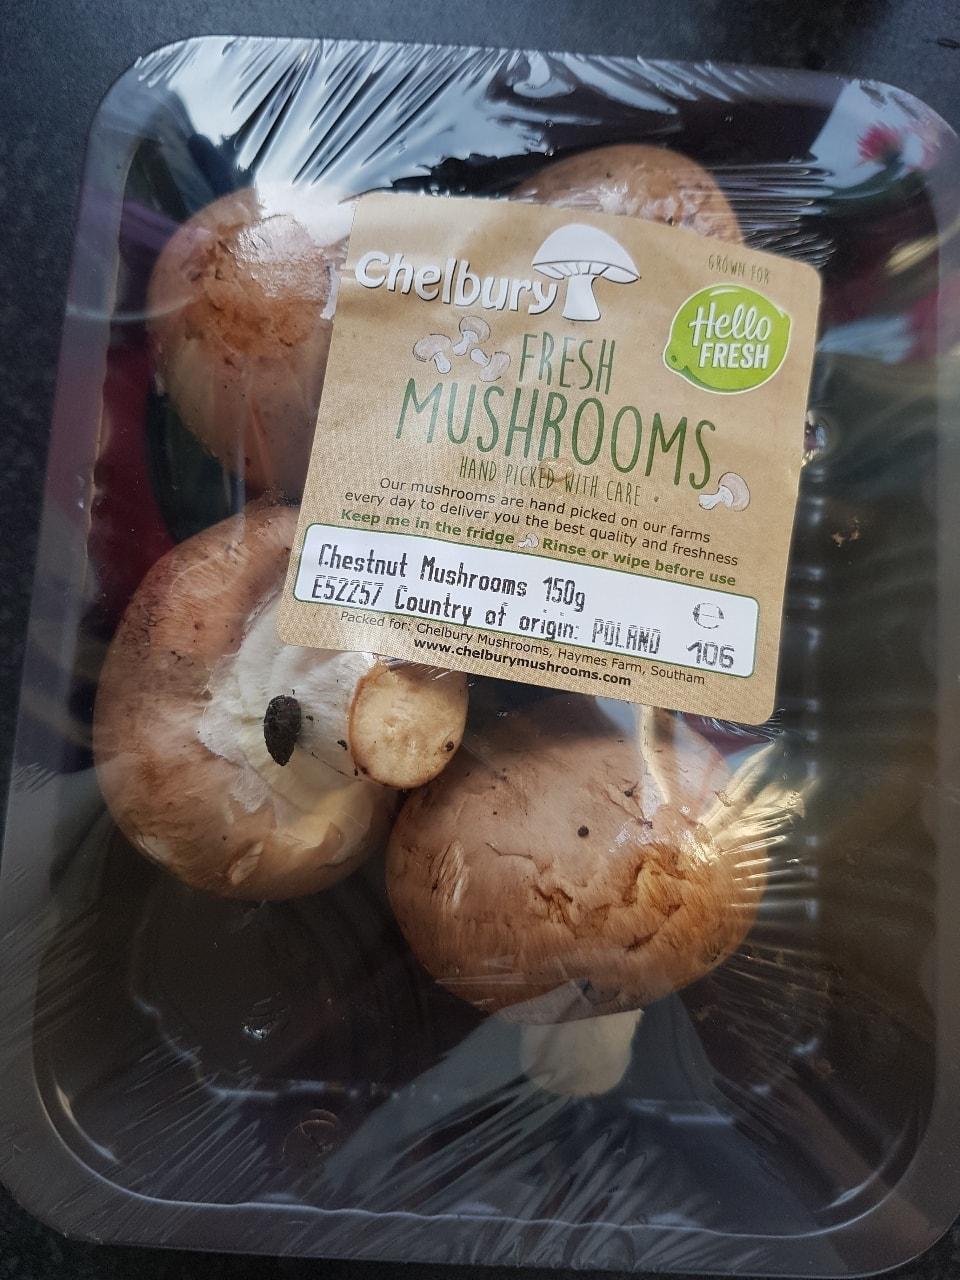 Chesnut mushrooms